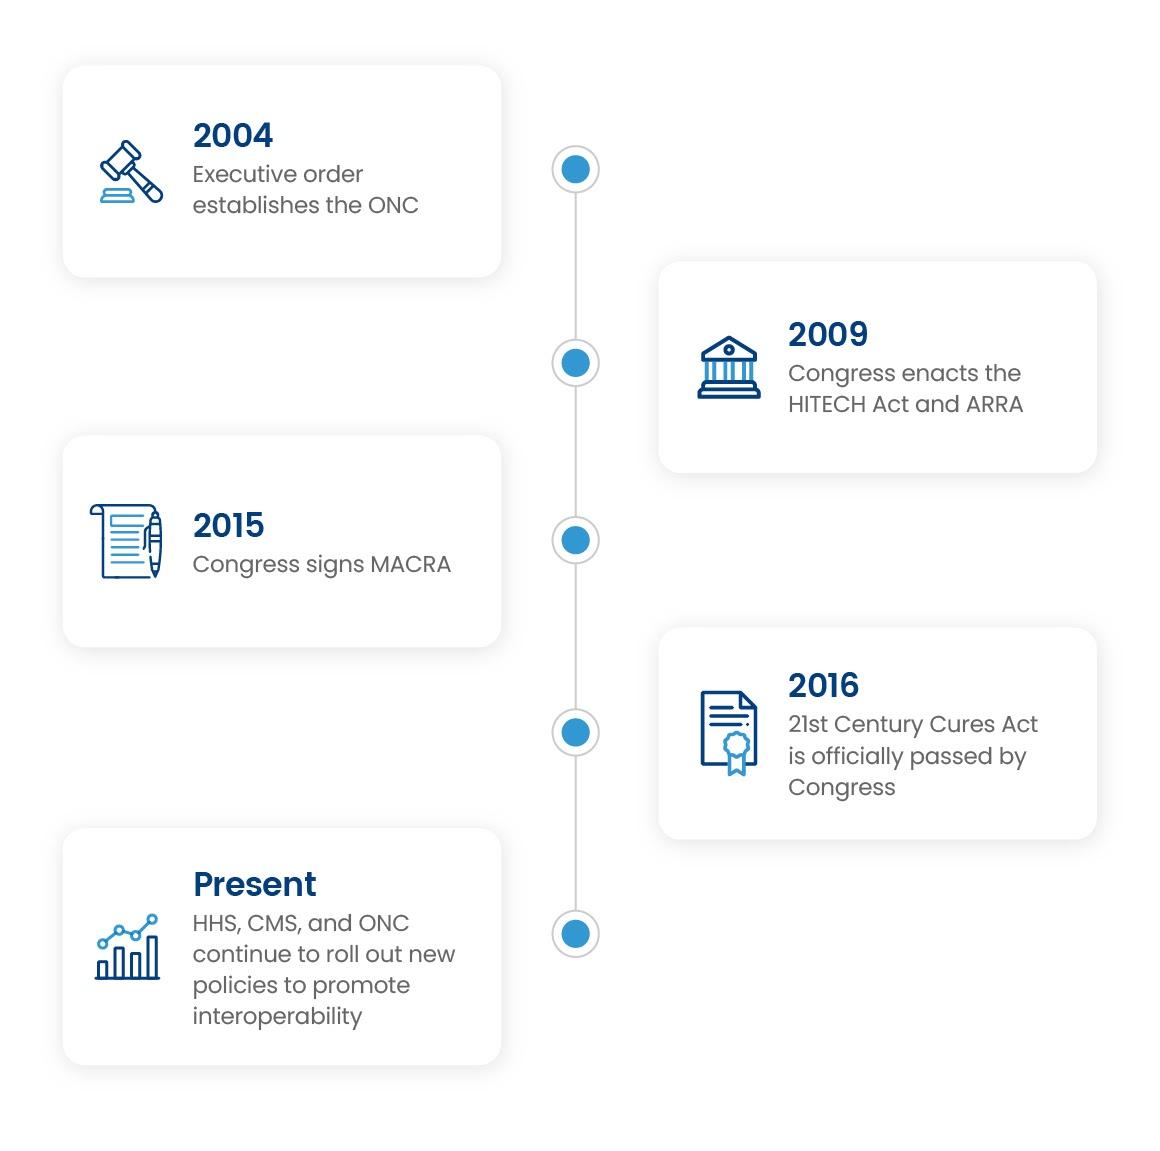 CuresAct-MACRA-MIPS-timeline